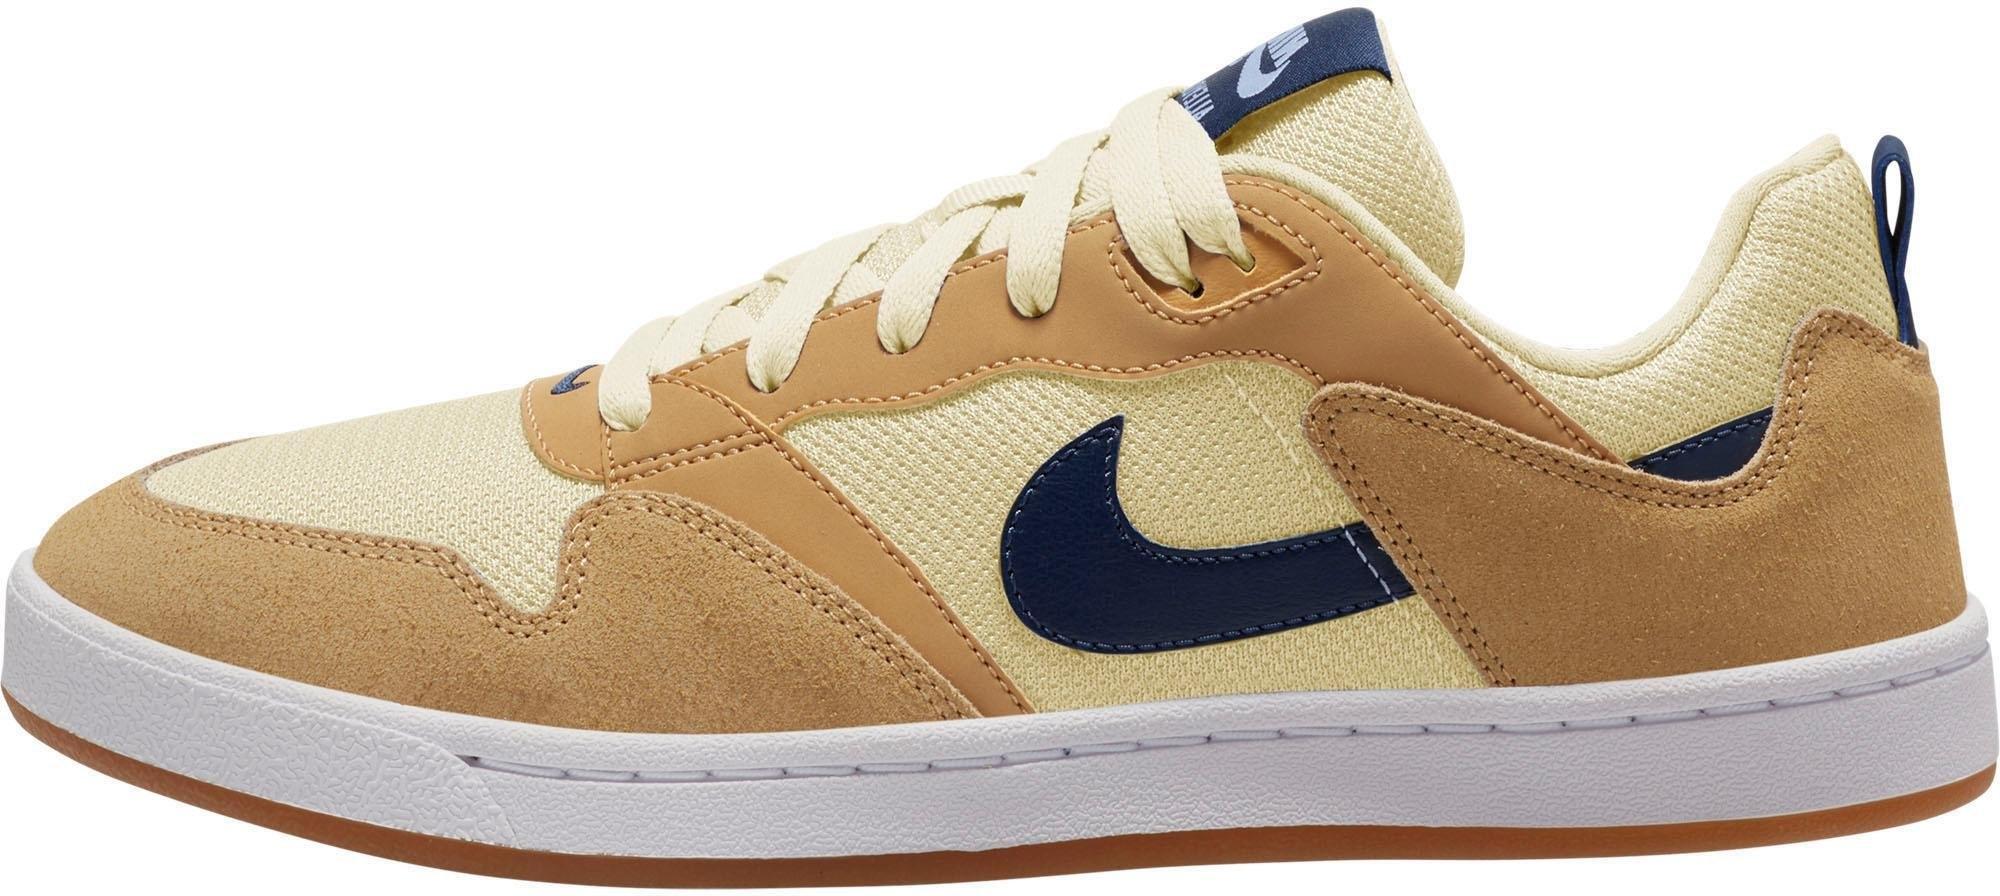 Nike SB sneakers »Alleyoop Skate« - verschillende betaalmethodes